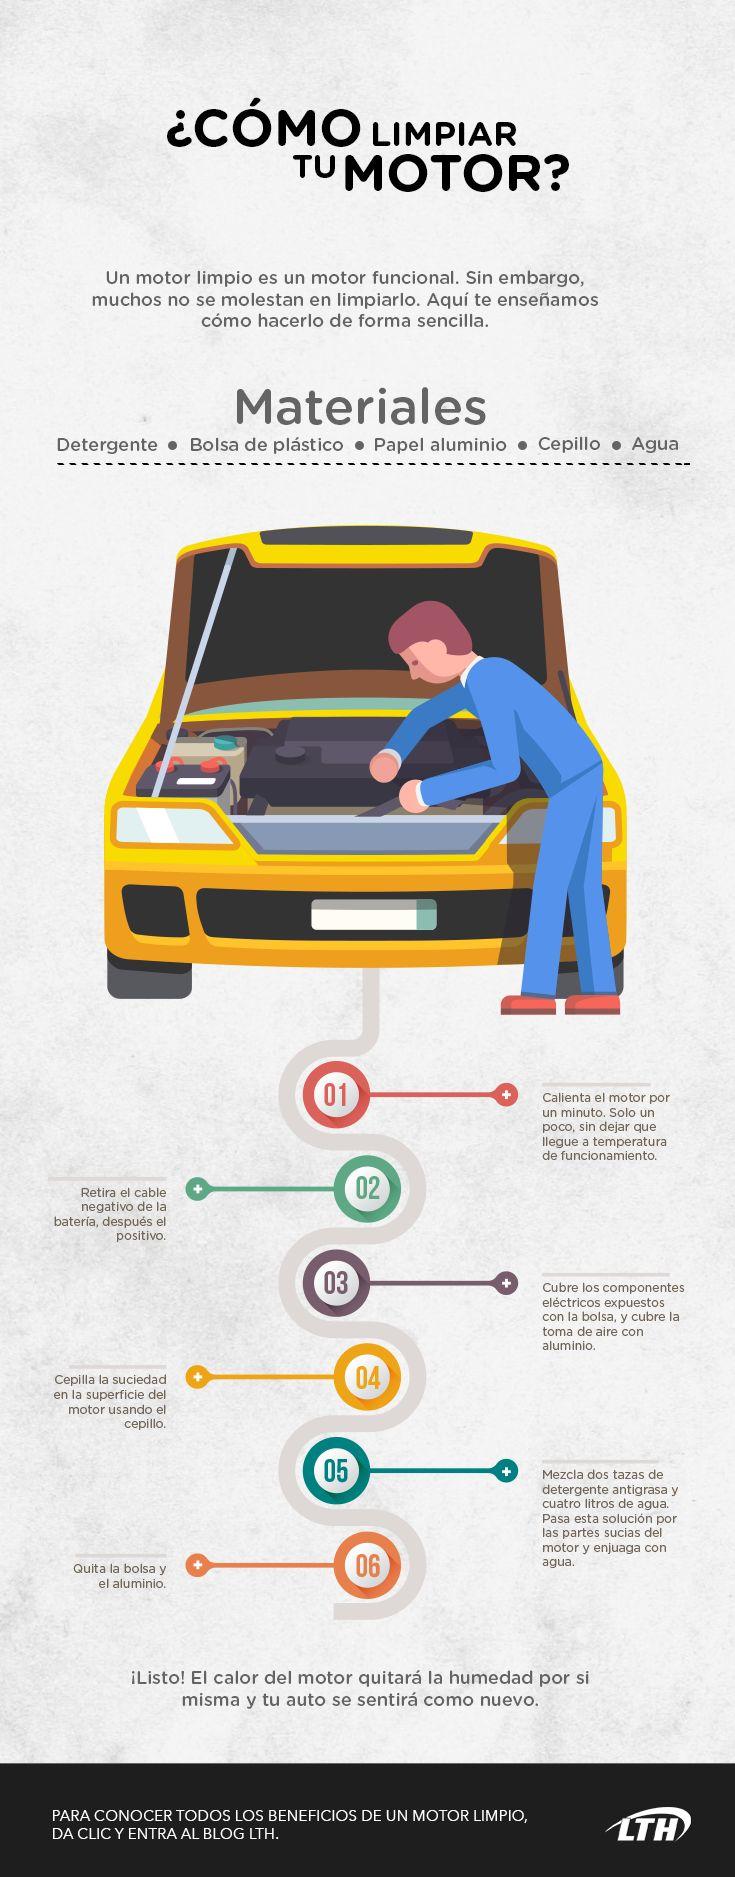 170 best autos images on pinterest cars electrical engineering las limpiezas frecuentes son bsicas para mantener en buen estado tu auto fandeluxe Images